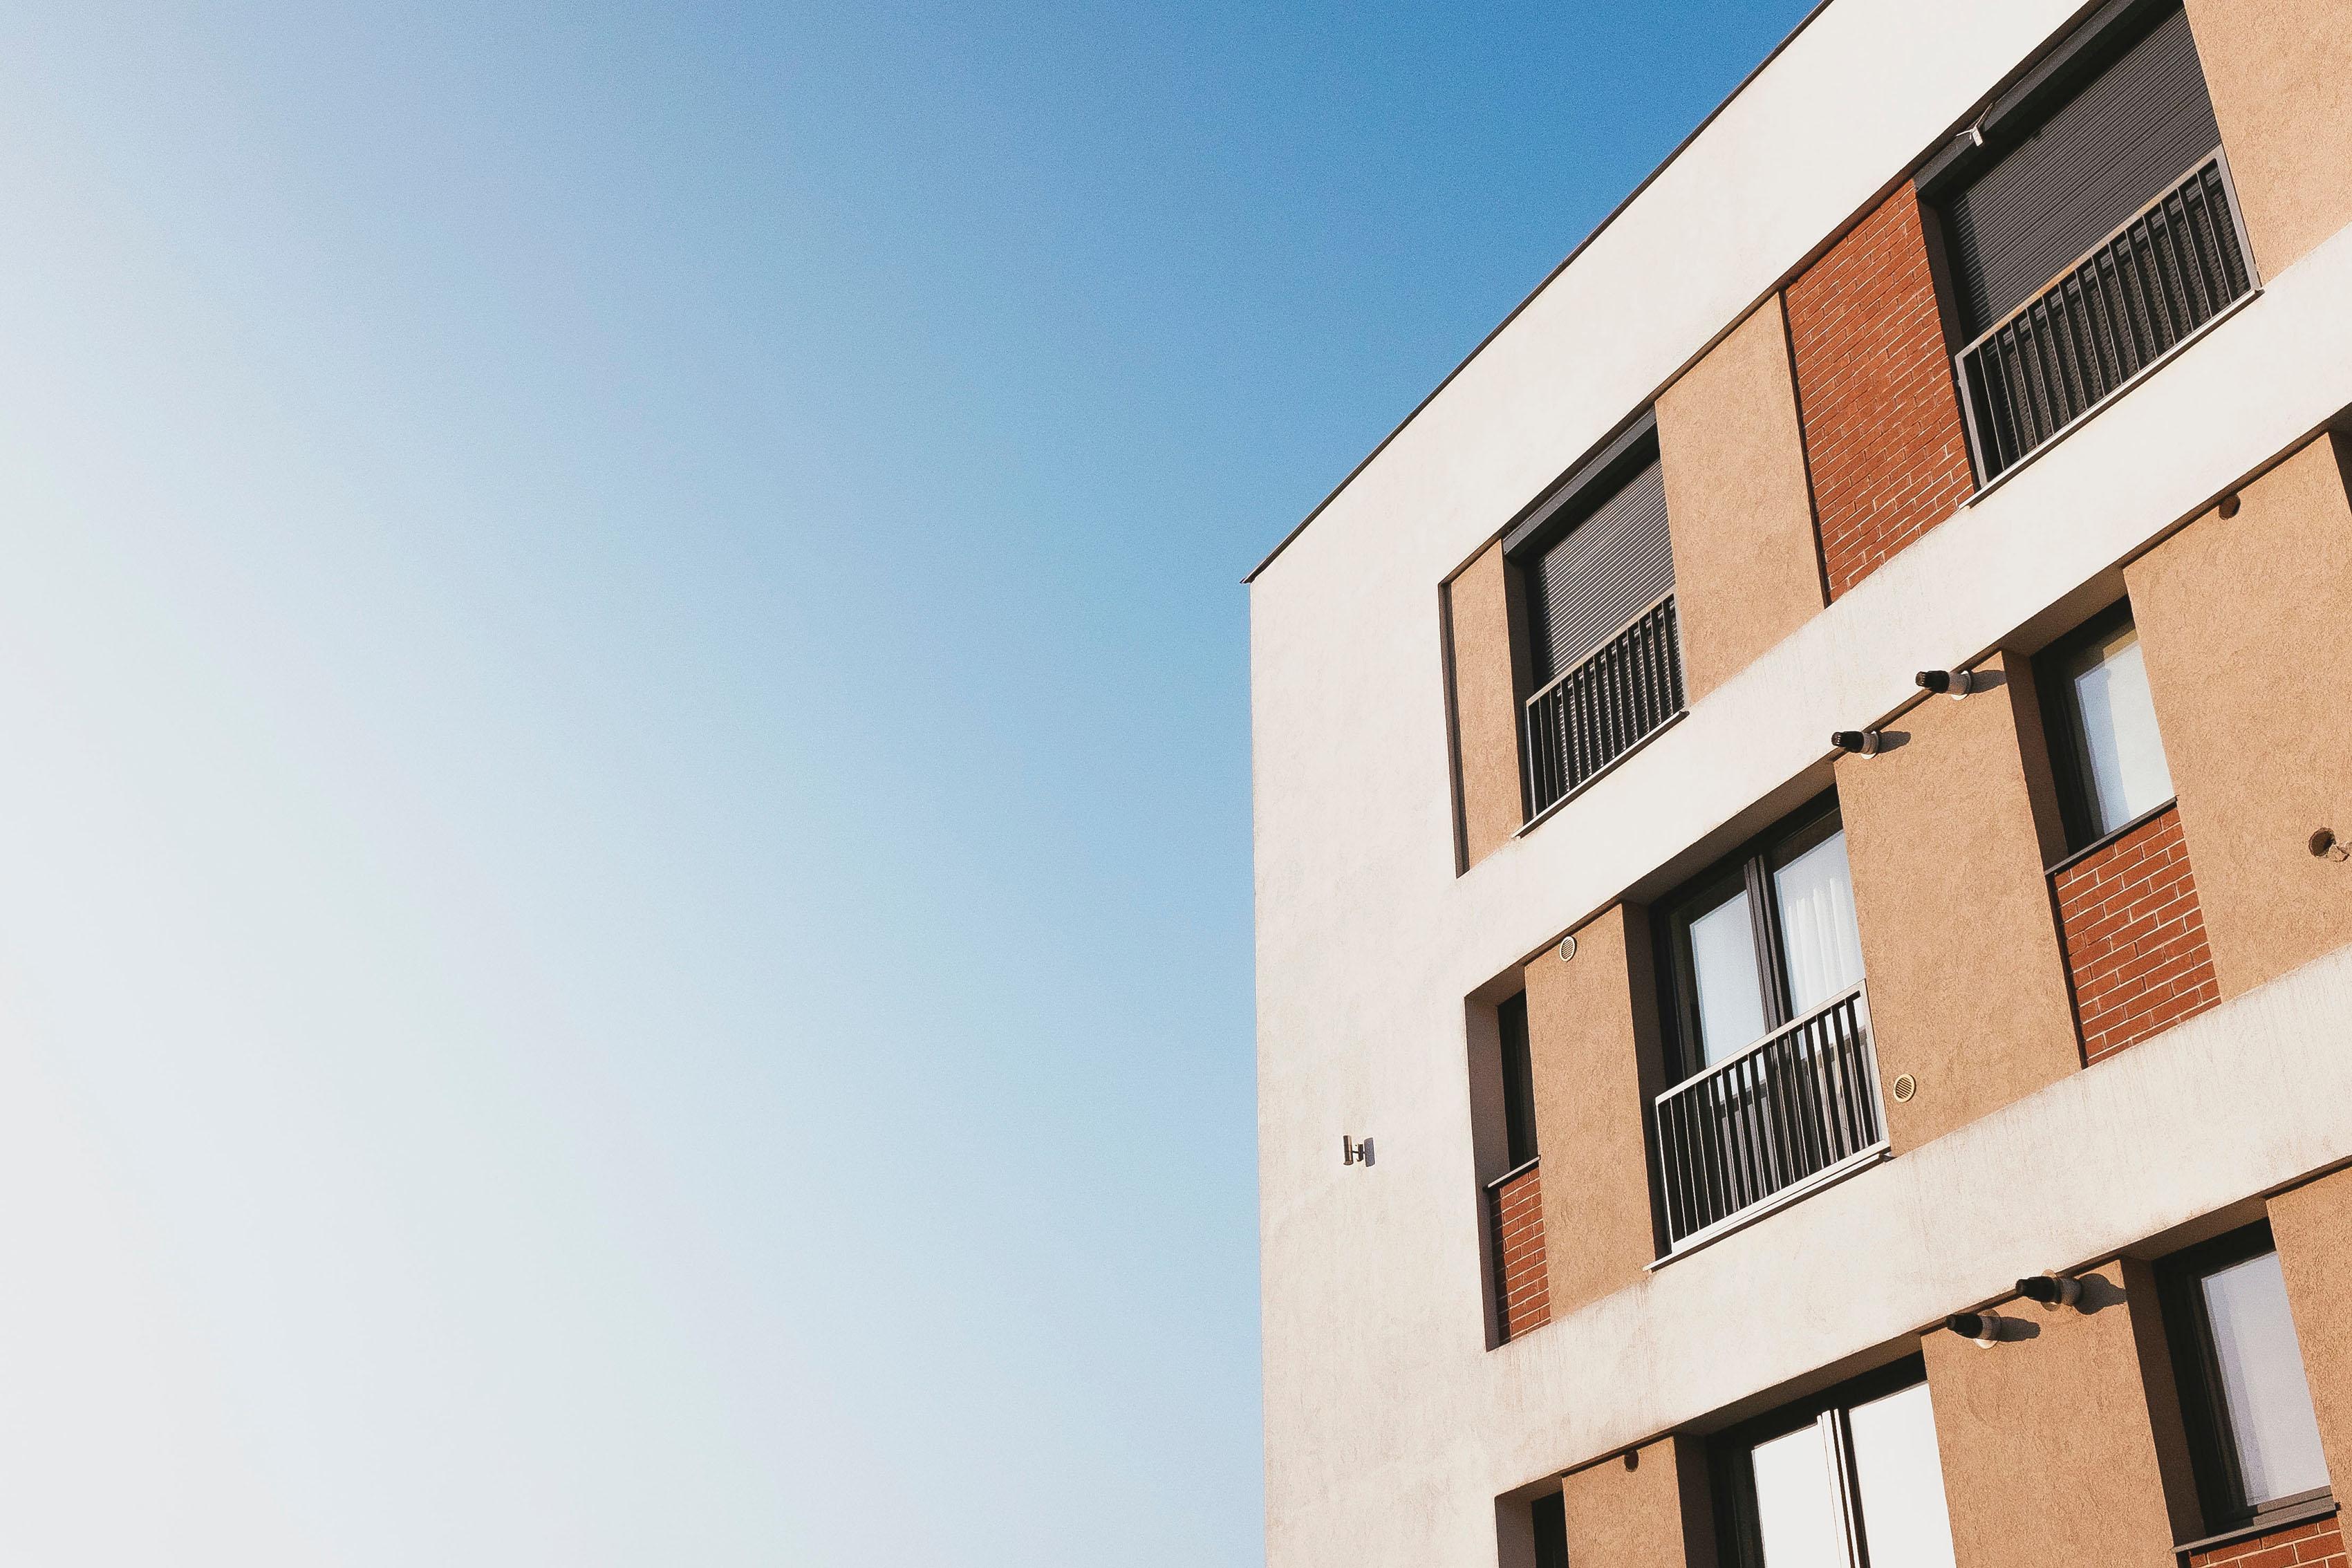 IVA Reducido Reformas de viviendas